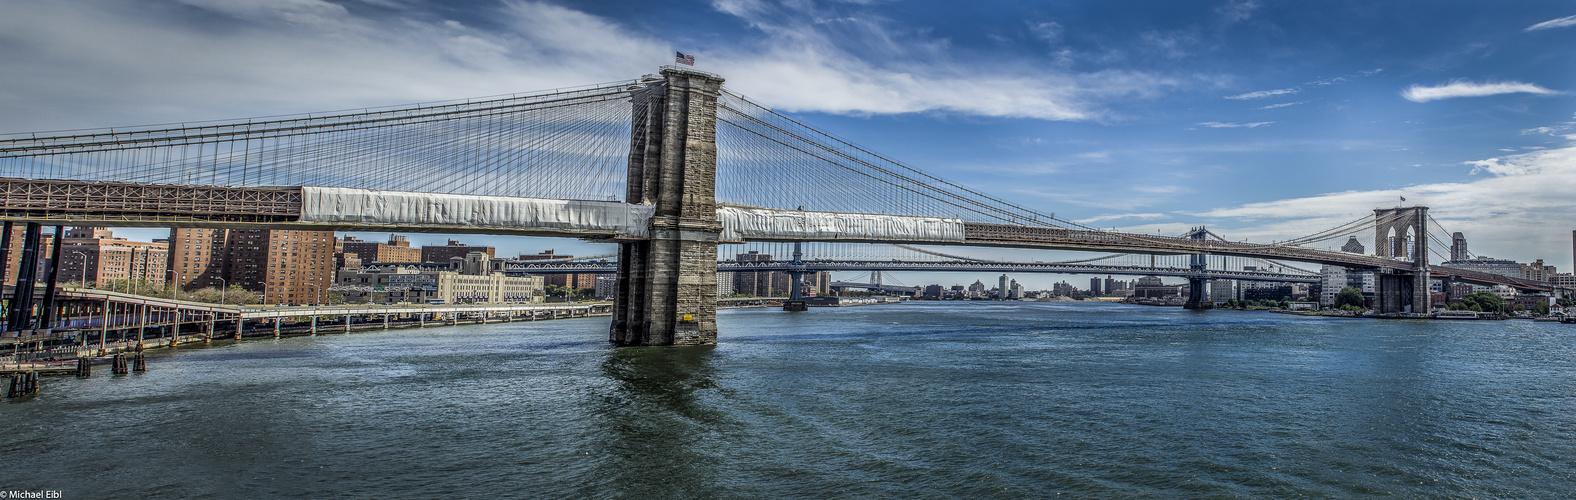 Brooklyn Bridge 2013